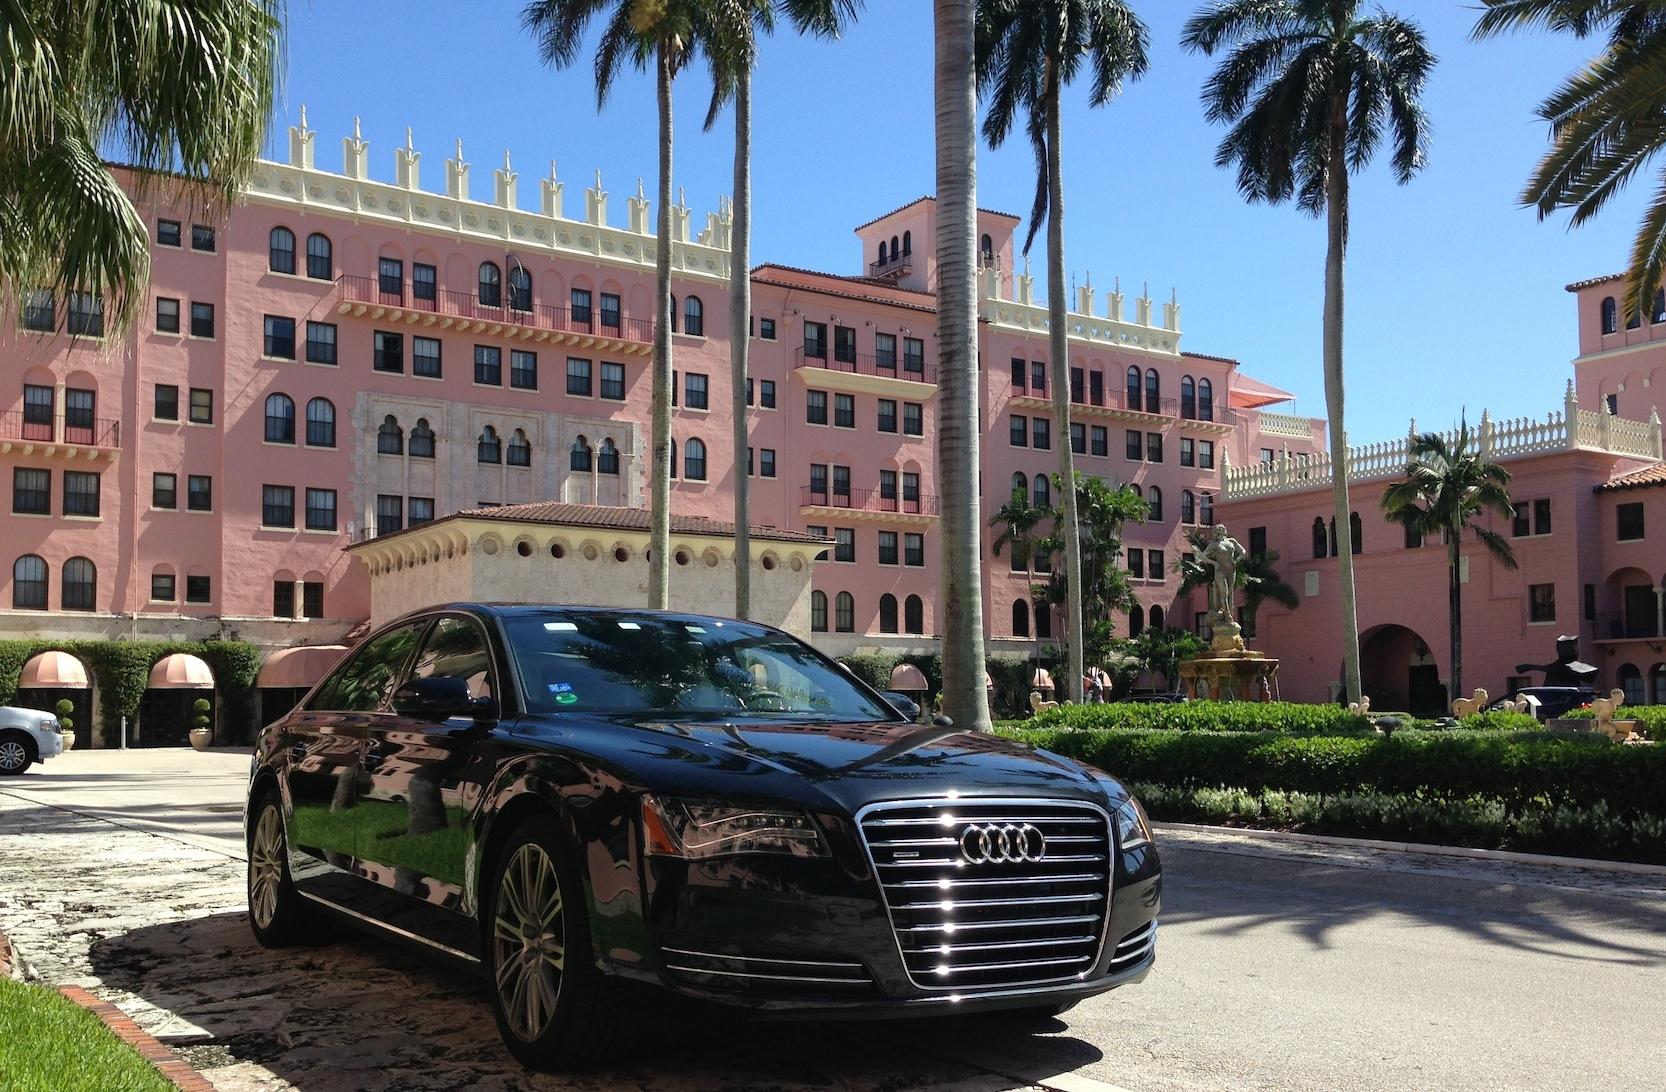 Fort Lauderdale To Boca Raton Car Service